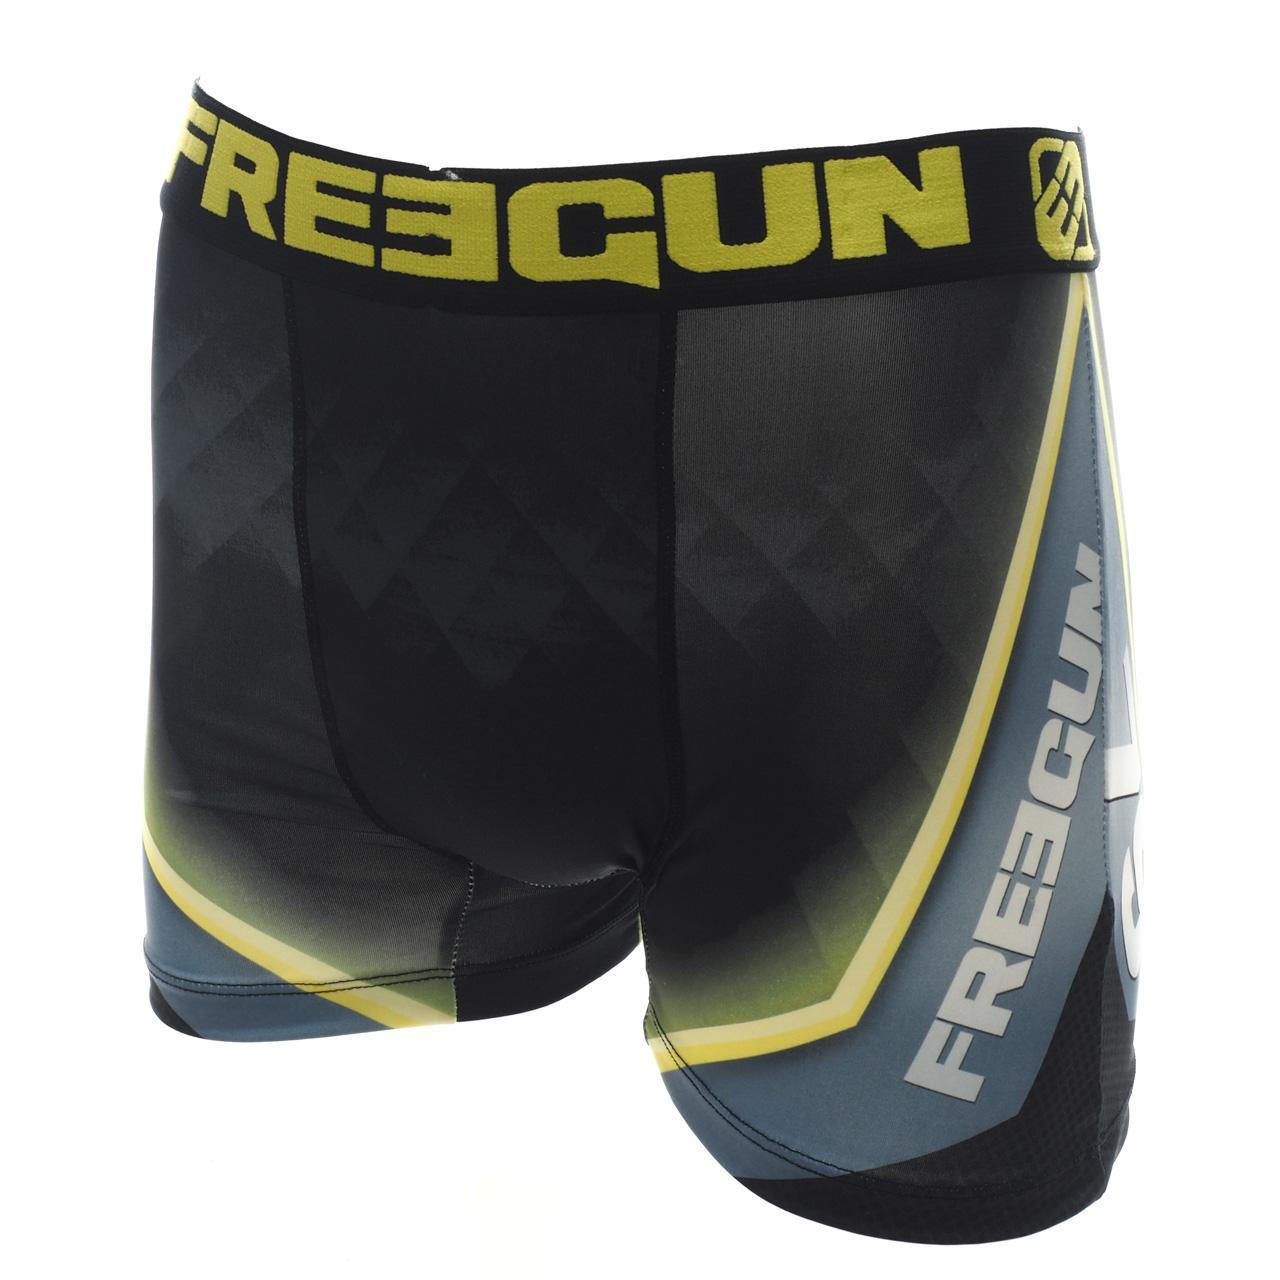 Underwear-Boxer-Freegun-Green-Black-Vrt-Black-Boxer-17919-New